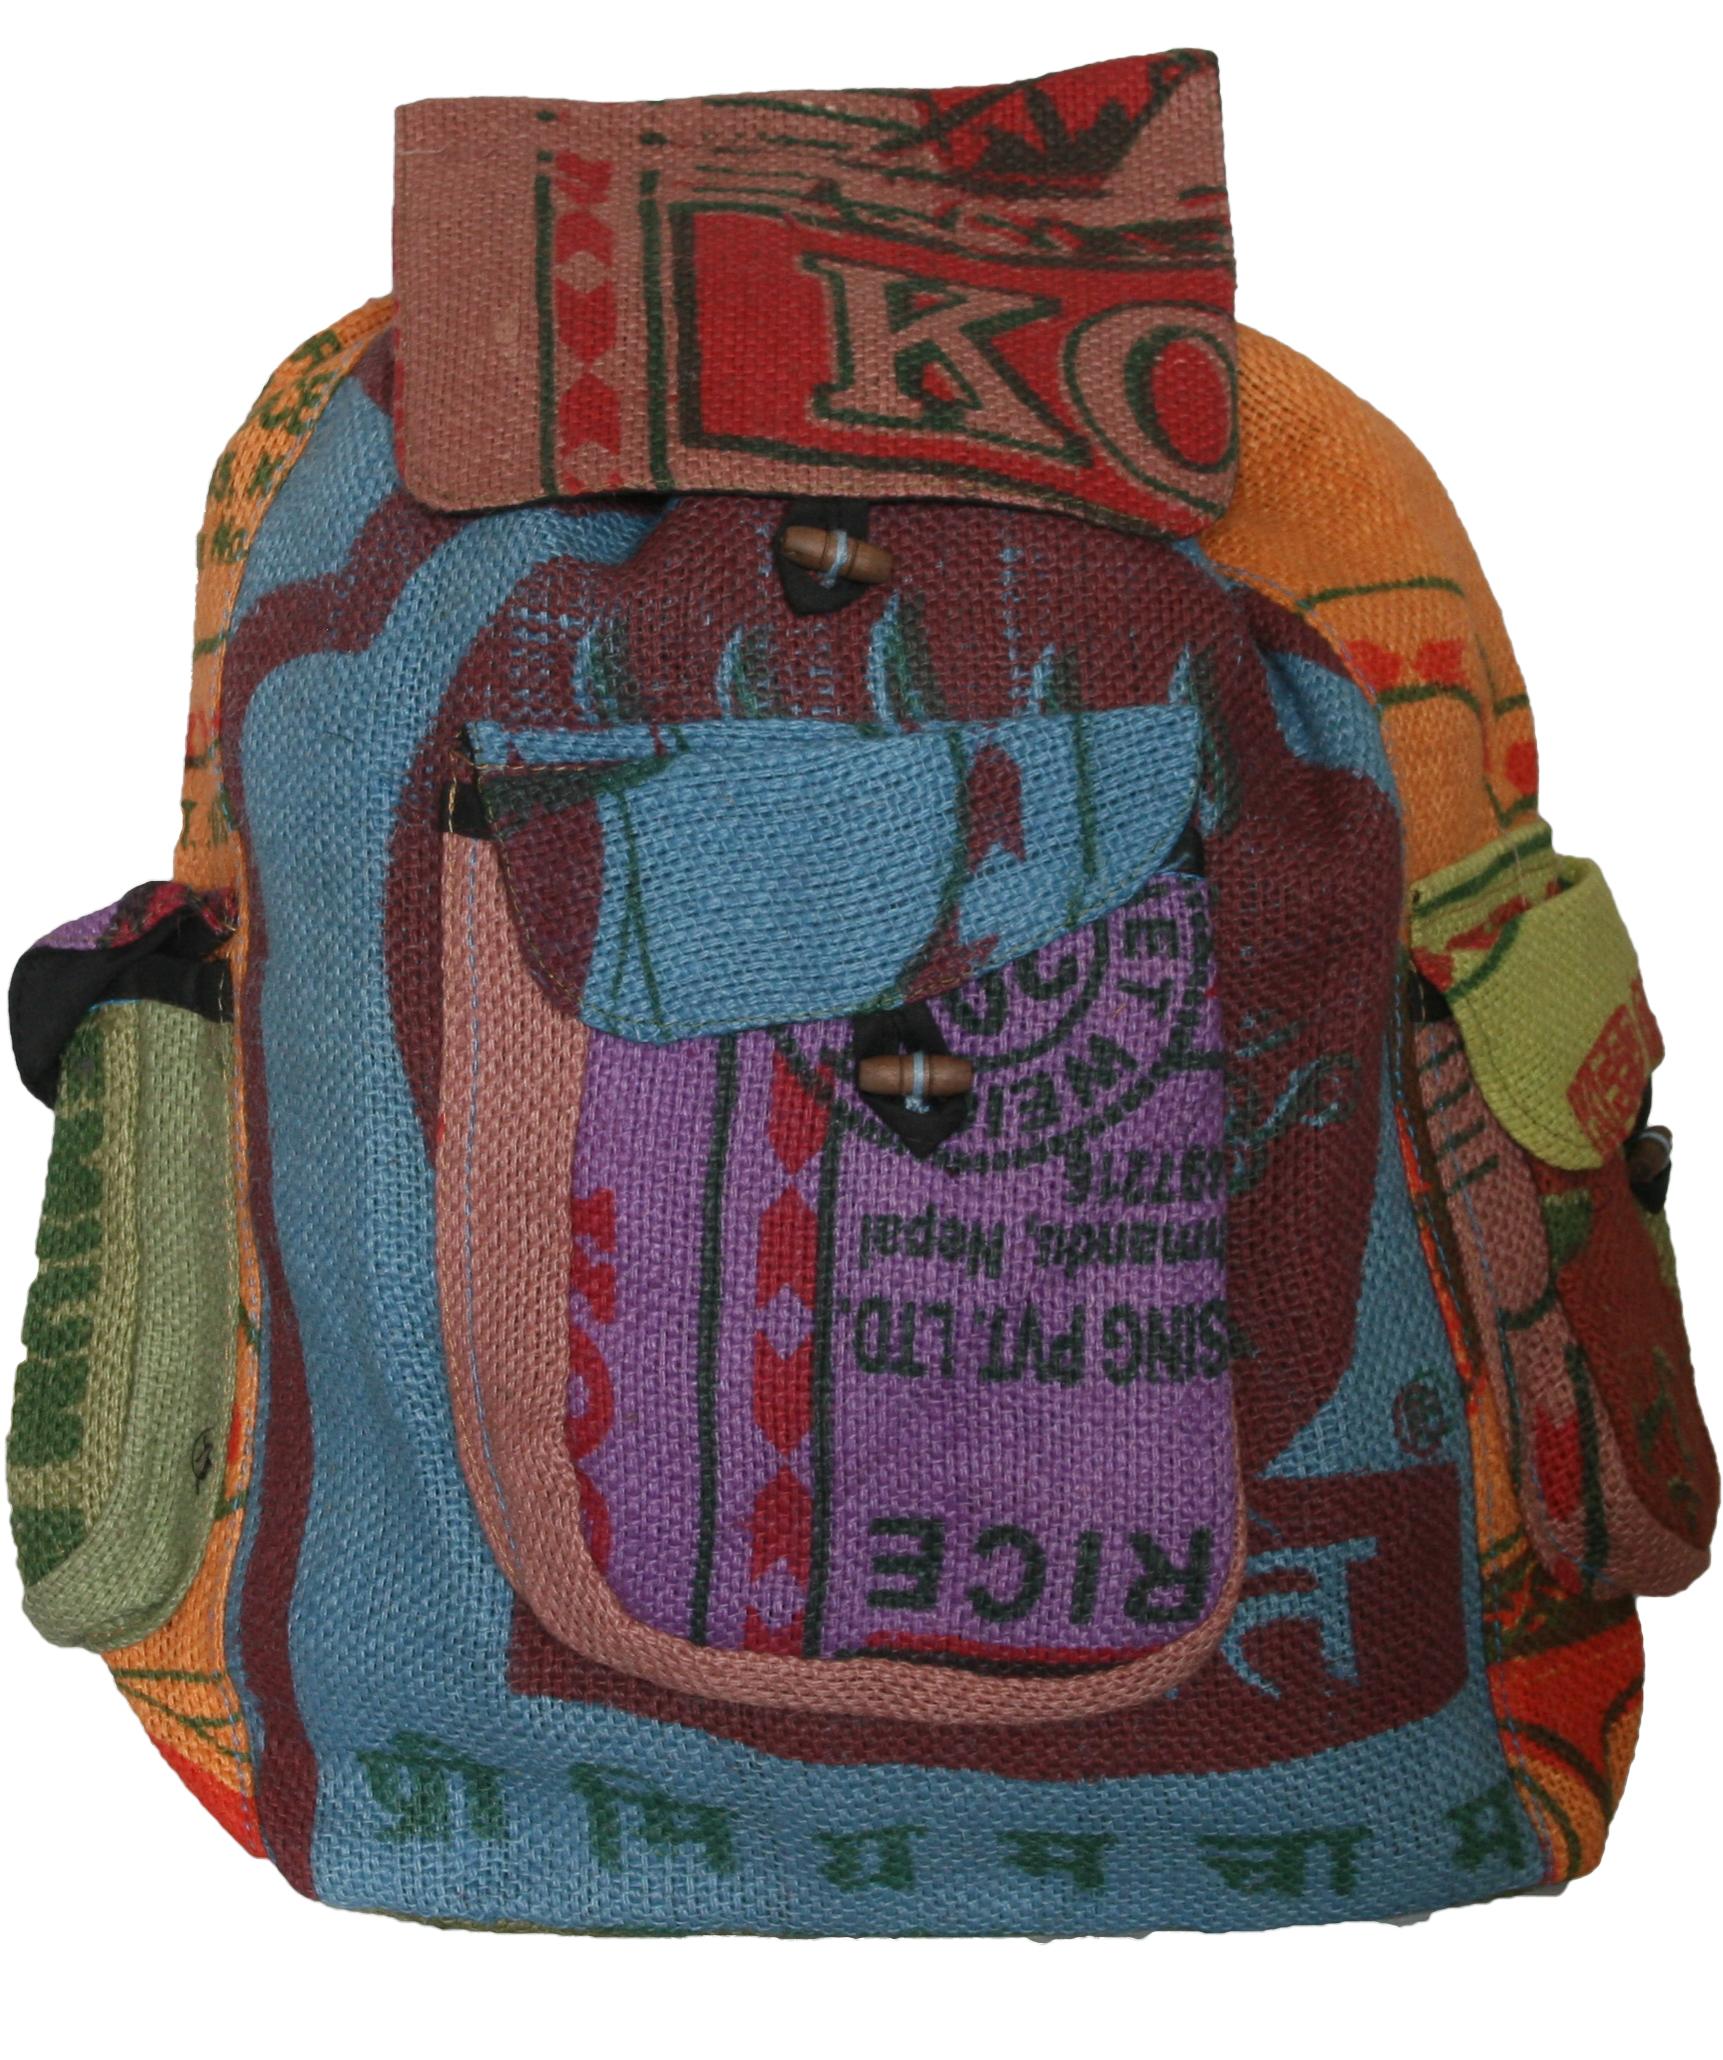 933e19345527d ... eco leather fair trade manbefair com. Fair Trade Rice Sack Rucksack.  Fair Trade Recyled Rice Sacks Wallets